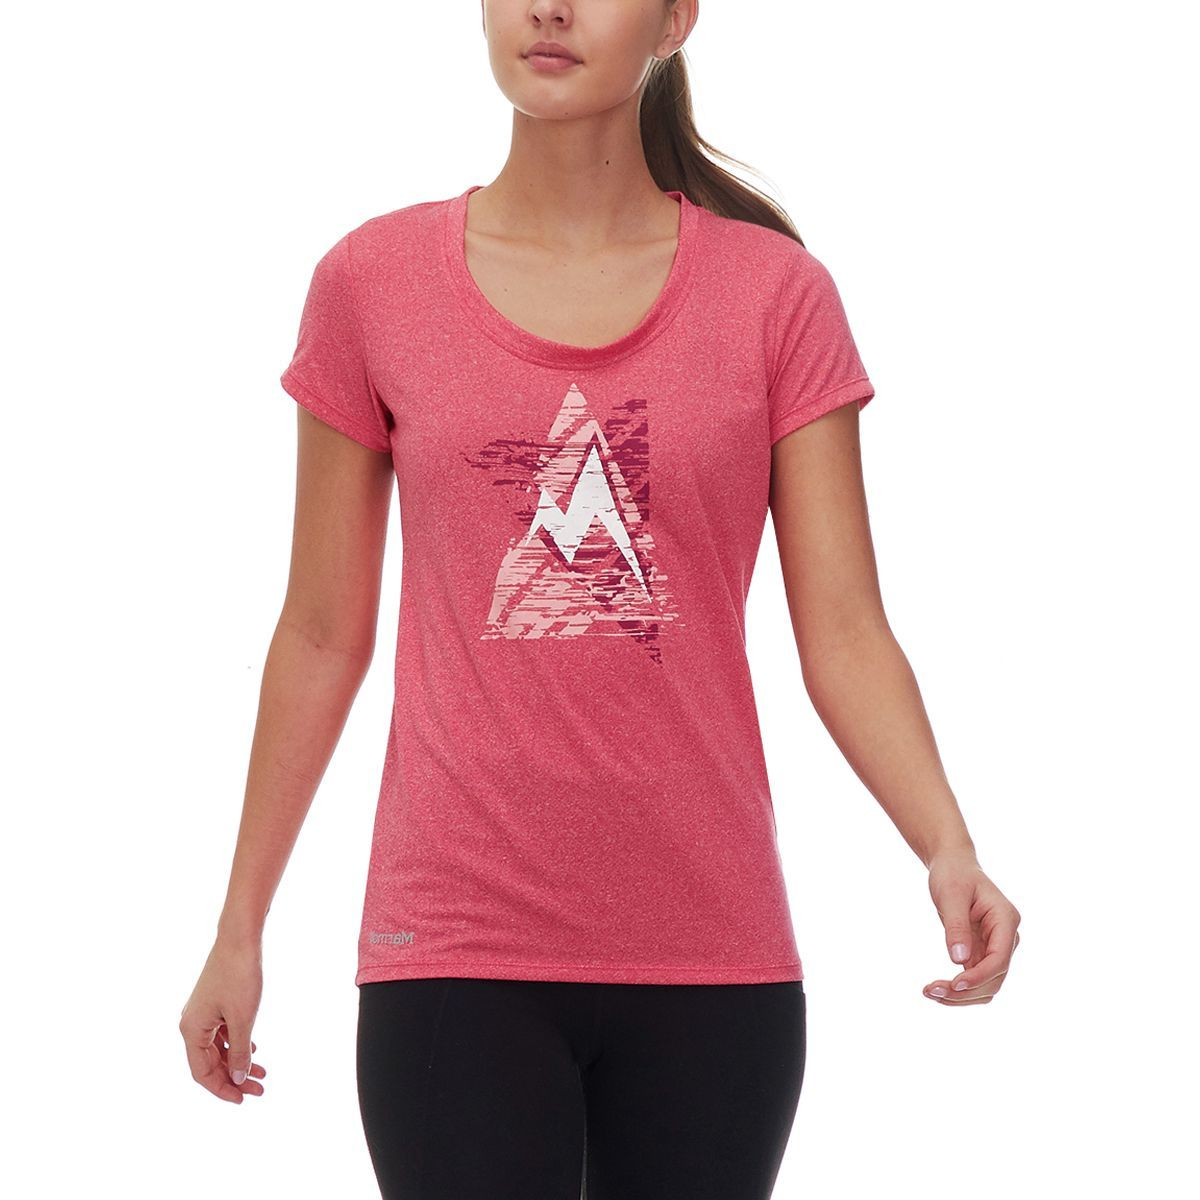 Marmot Post Time T-Shirt - Women's